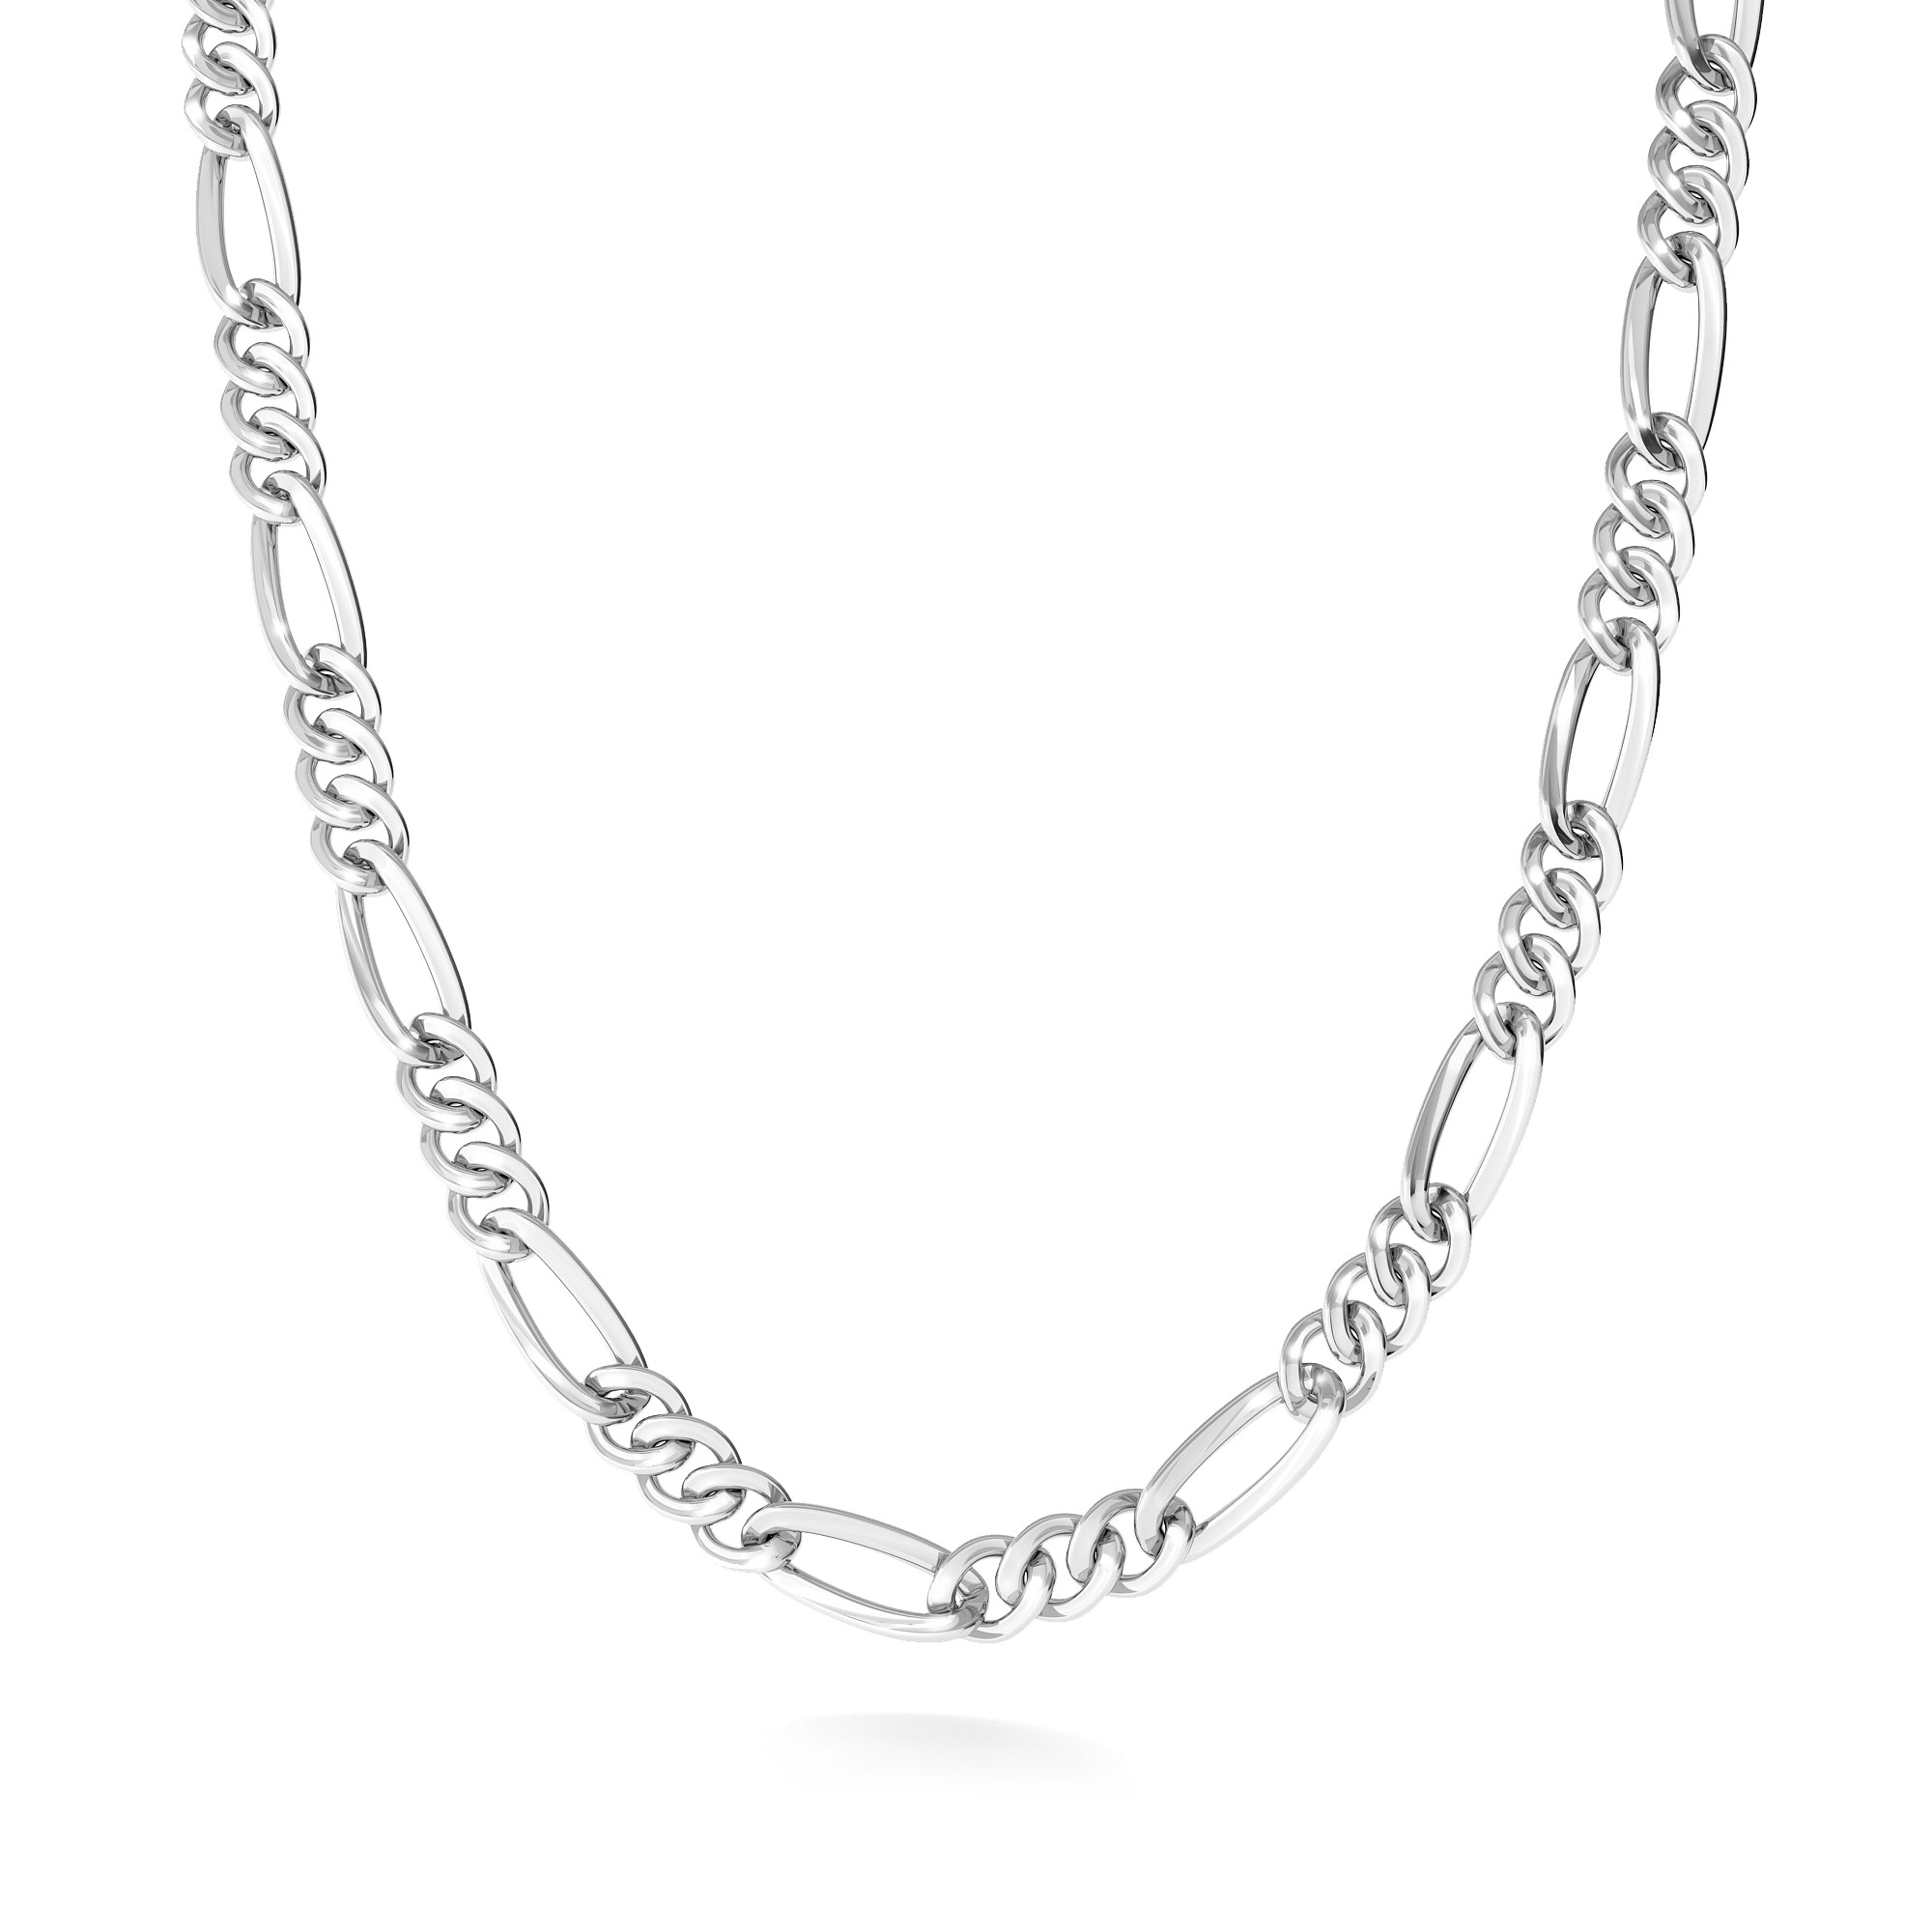 łańcuszek splot figaro Mon Defi, srebro 925